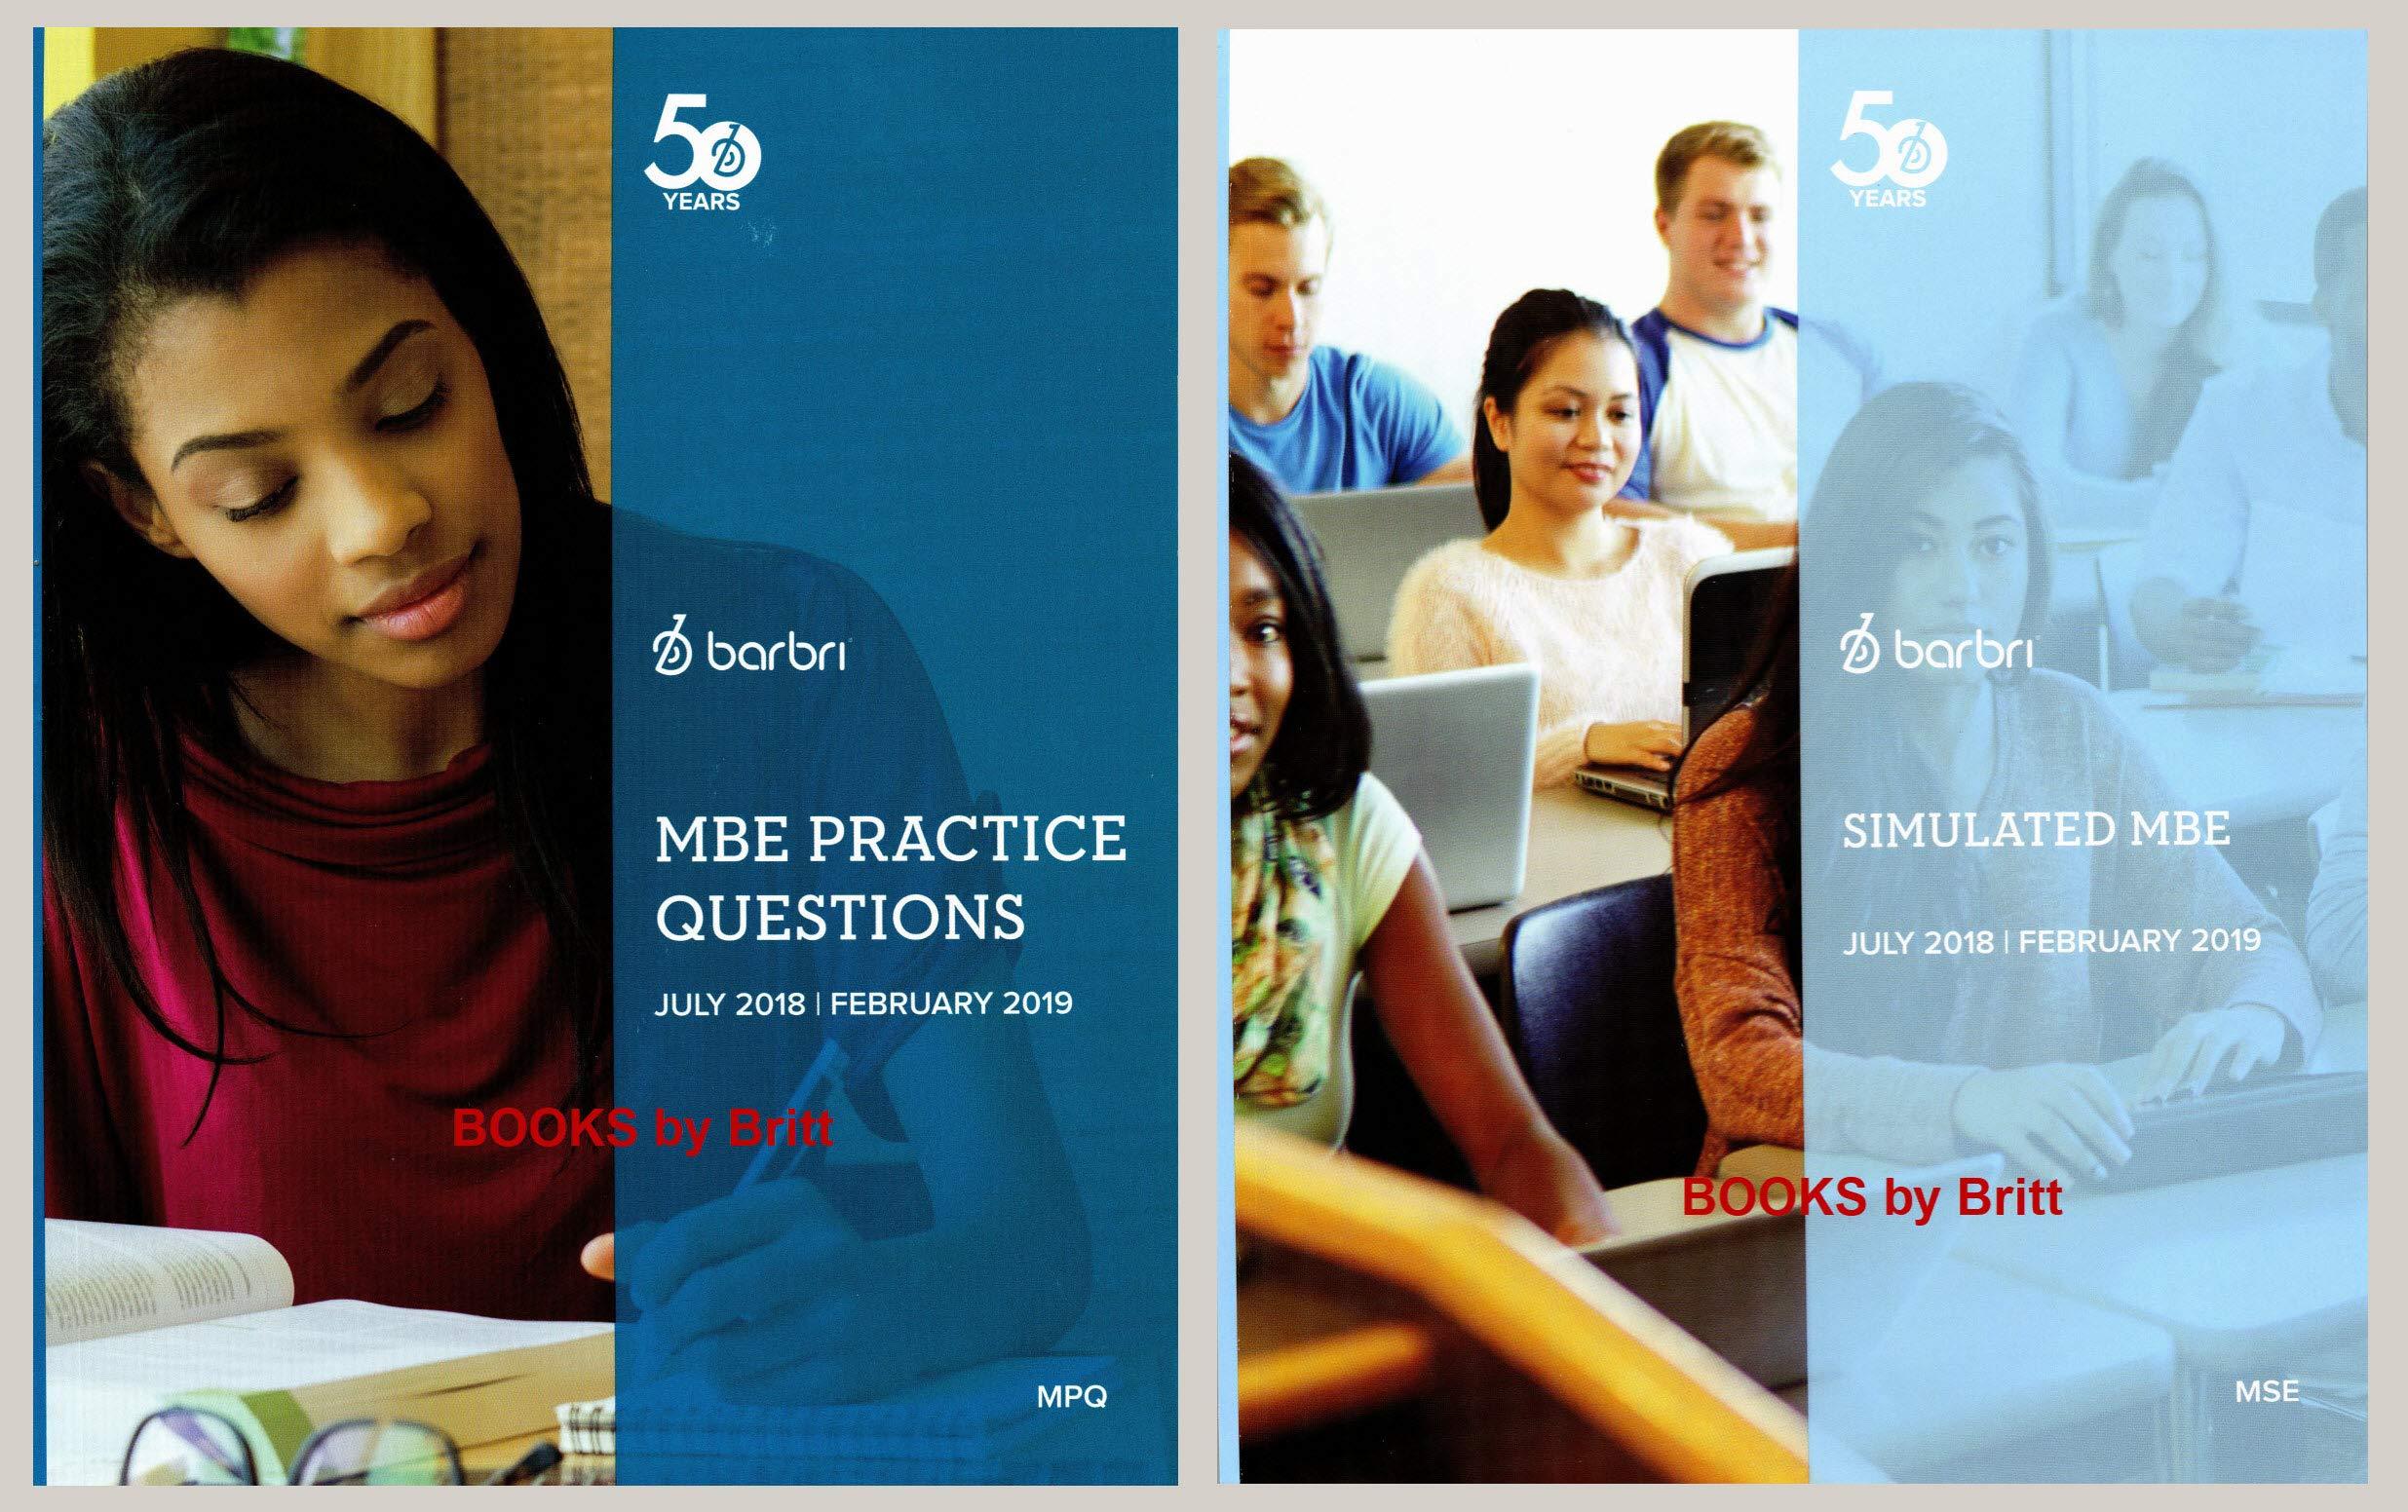 2018-2019 Barbri Bar Exam MBE 2books - MBE Practice